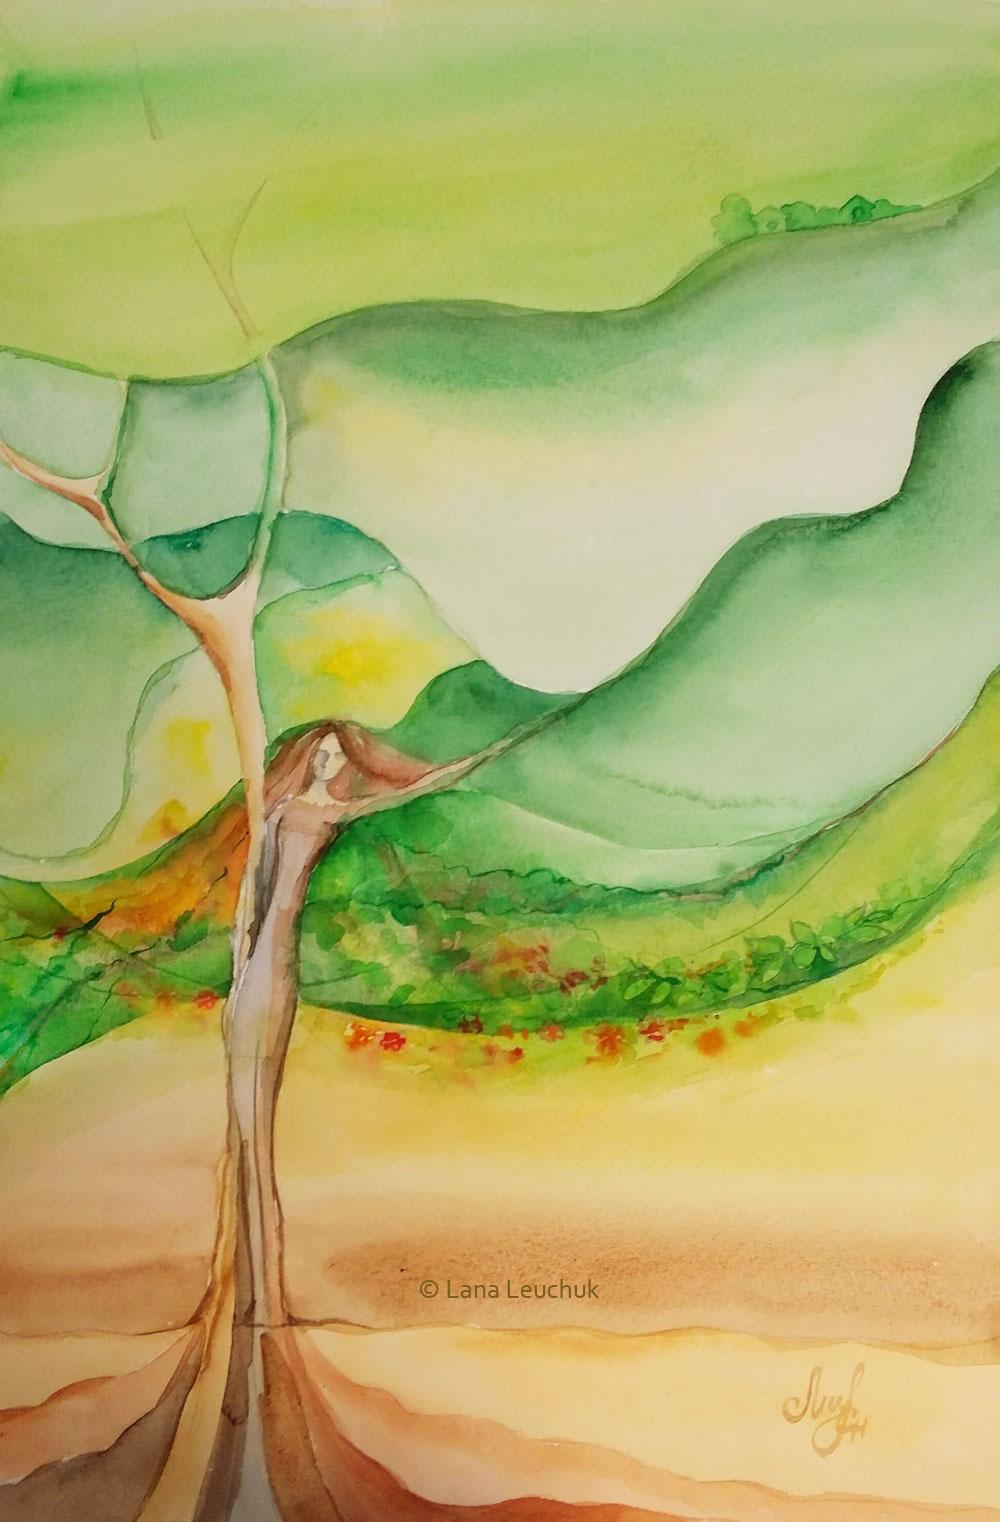 Lady-Earth-art-by-Lana-Leuchuk-Lanagraphic